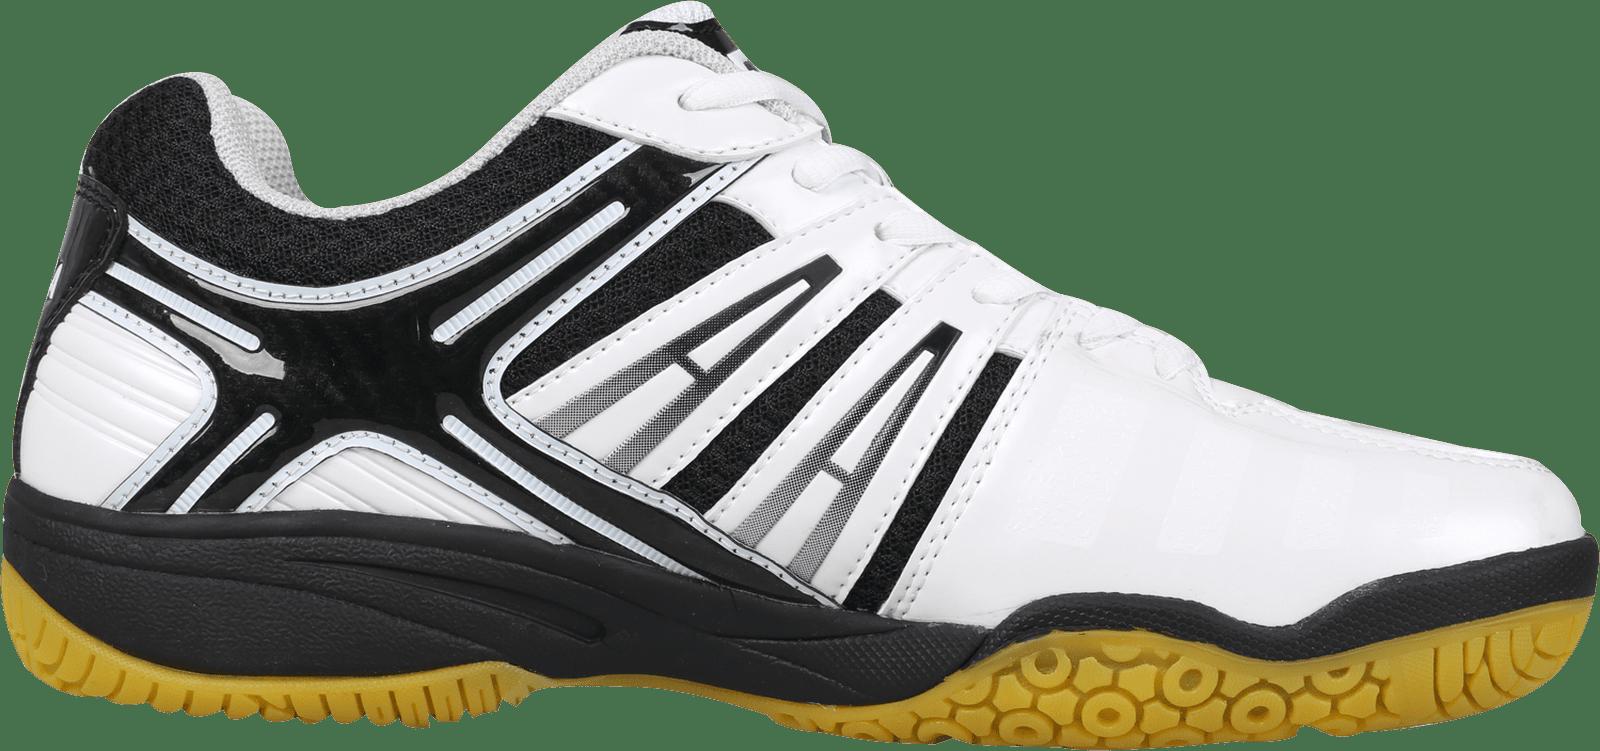 Forza Leander Shoes Men Black